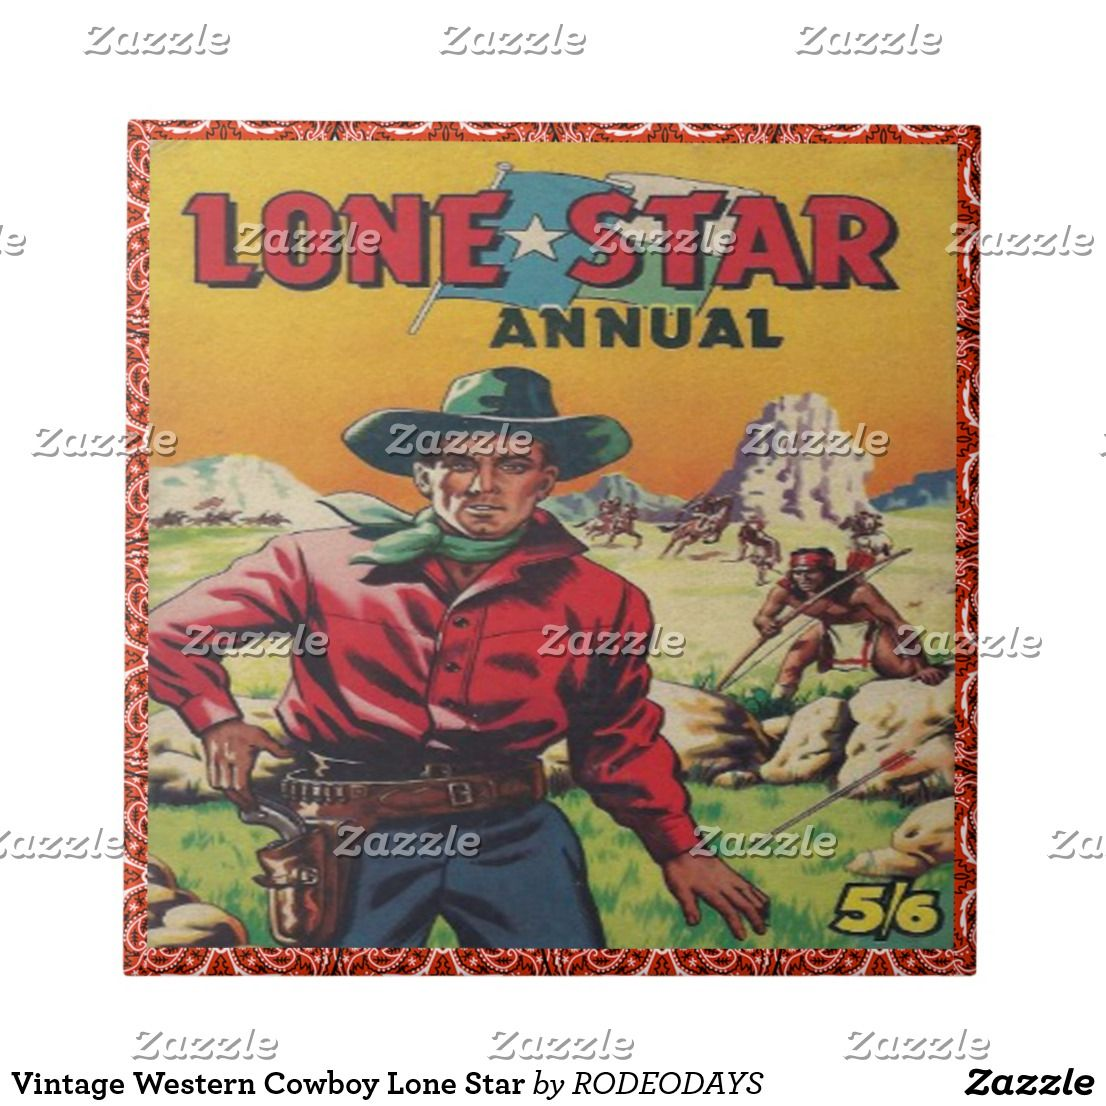 Vintage Western Cowboy Lone Star Ceramic Tile Zazzle Com Cowboy Posters Vintage Western Western Wall Art